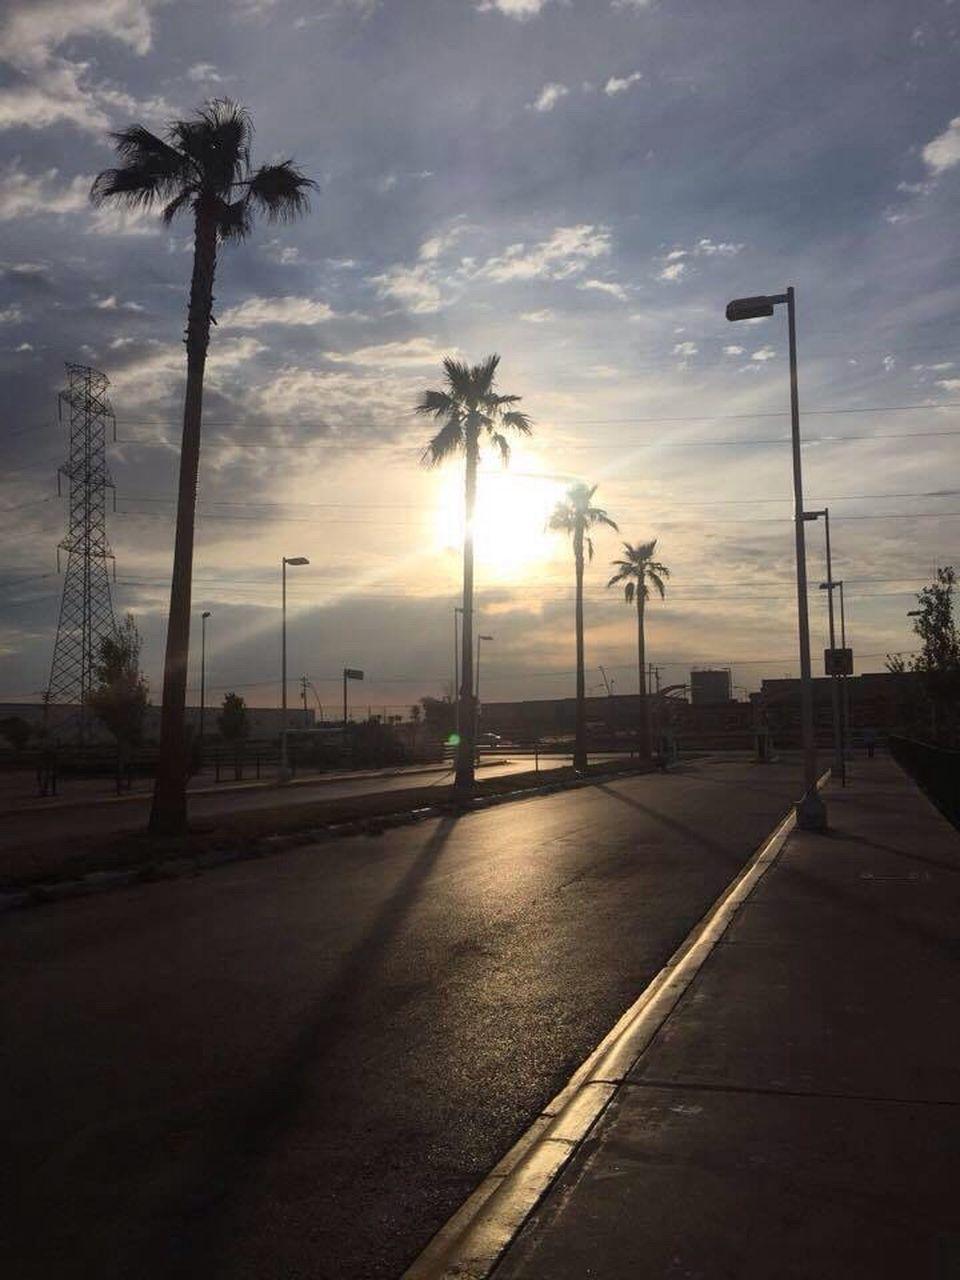 sunset, palm tree, transportation, sky, cloud - sky, road, street light, no people, tree, outdoors, nature, city, day